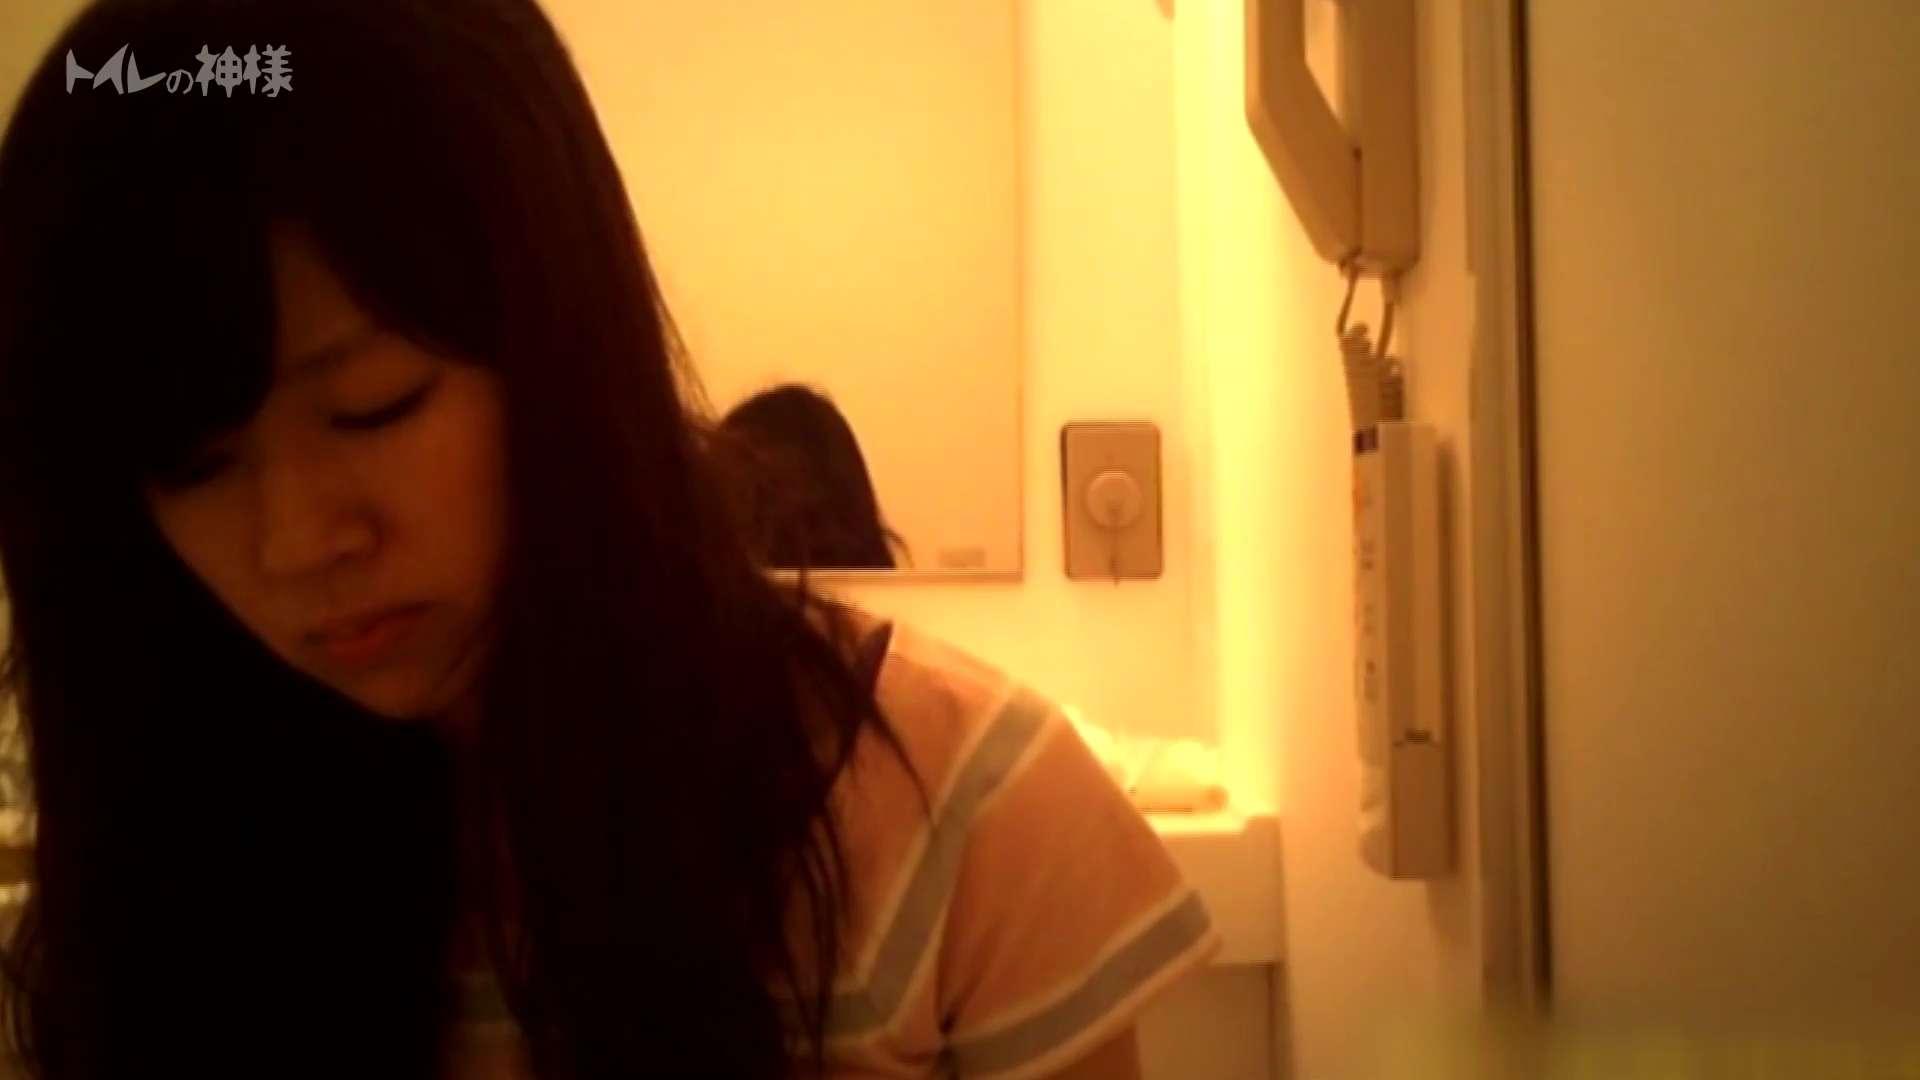 Vol.04 女子大生のトイレ恥態 OLハメ撮り  104Pix 7